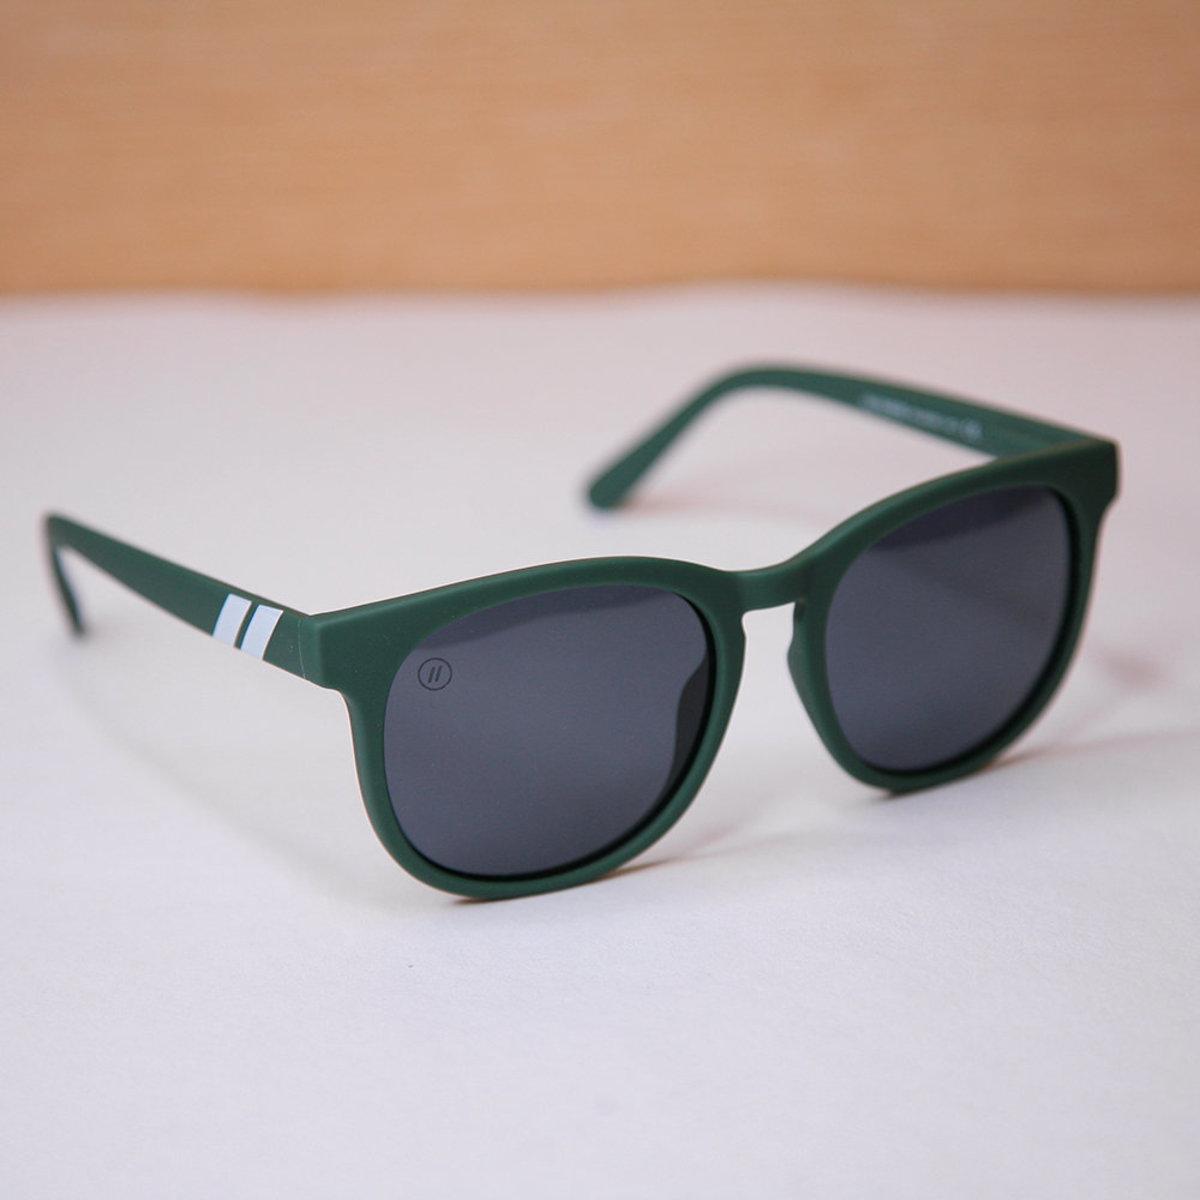 H Series // Ava Parker Polarized Sunglasses